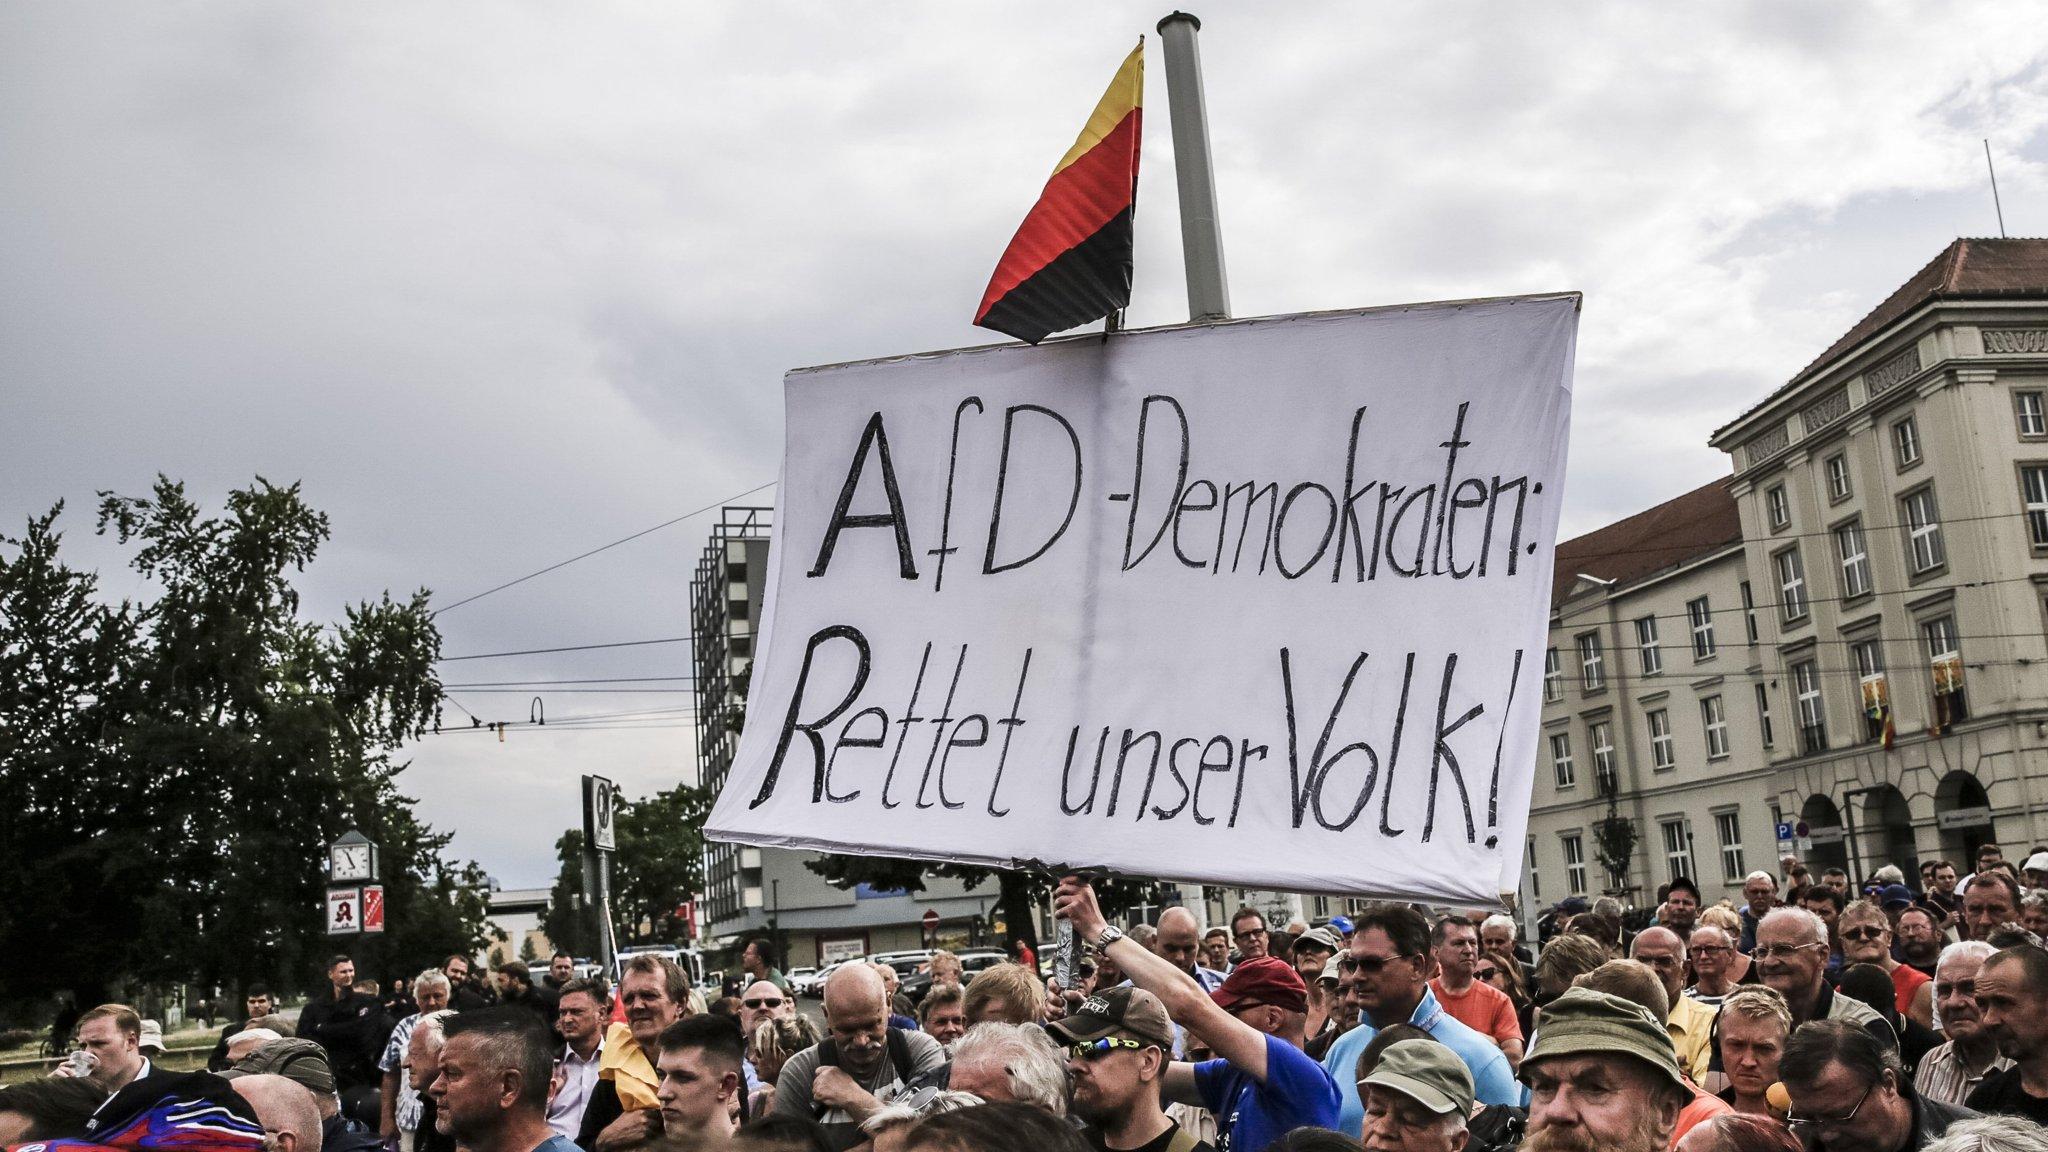 Germany is replaying Britain's Brexit debate